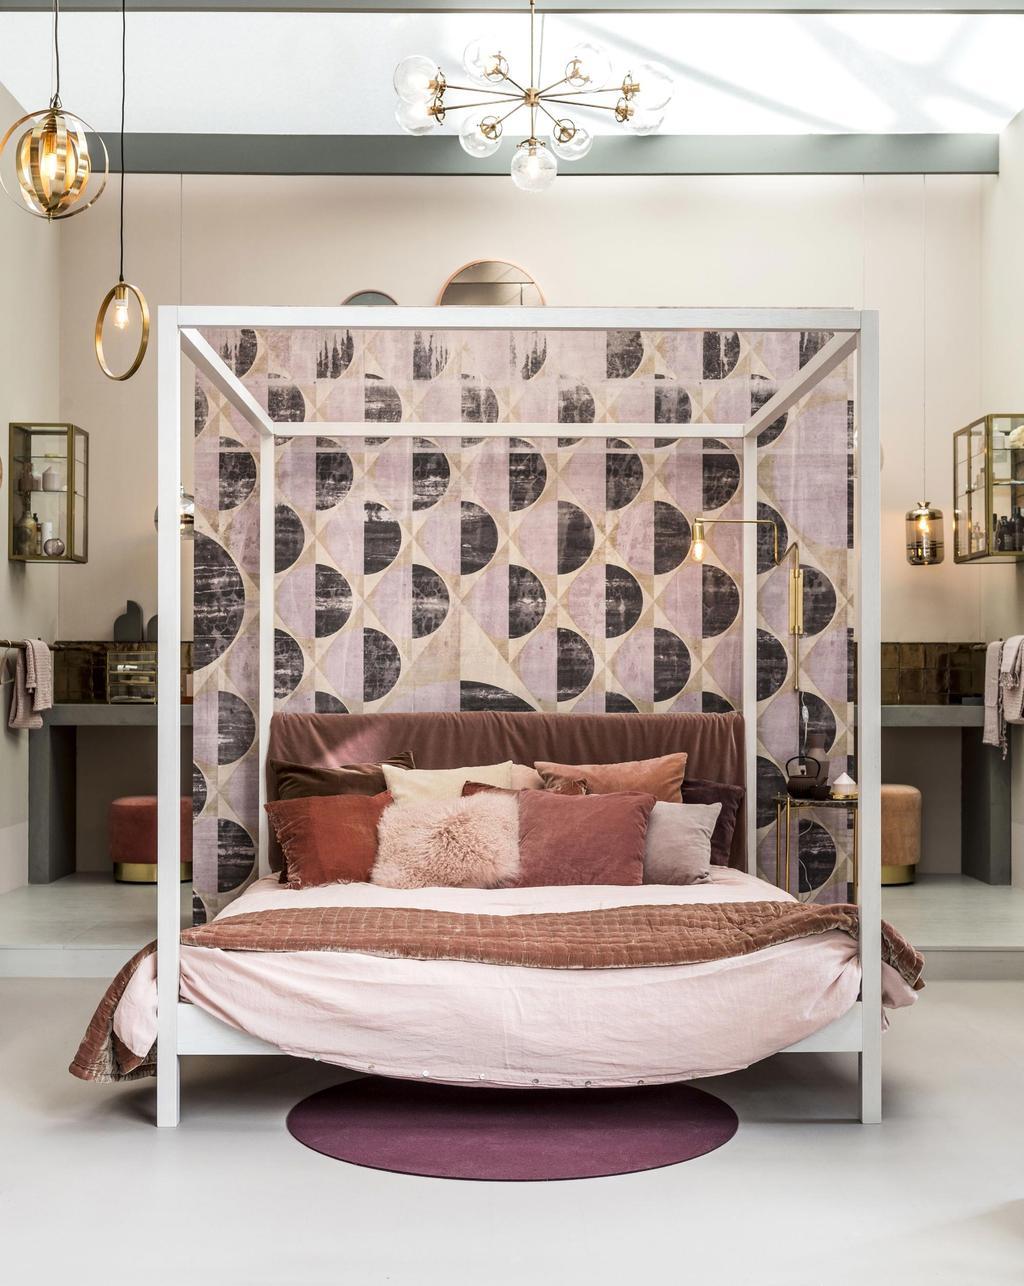 Roze slaapkamer vt wonen&design beurs 2017